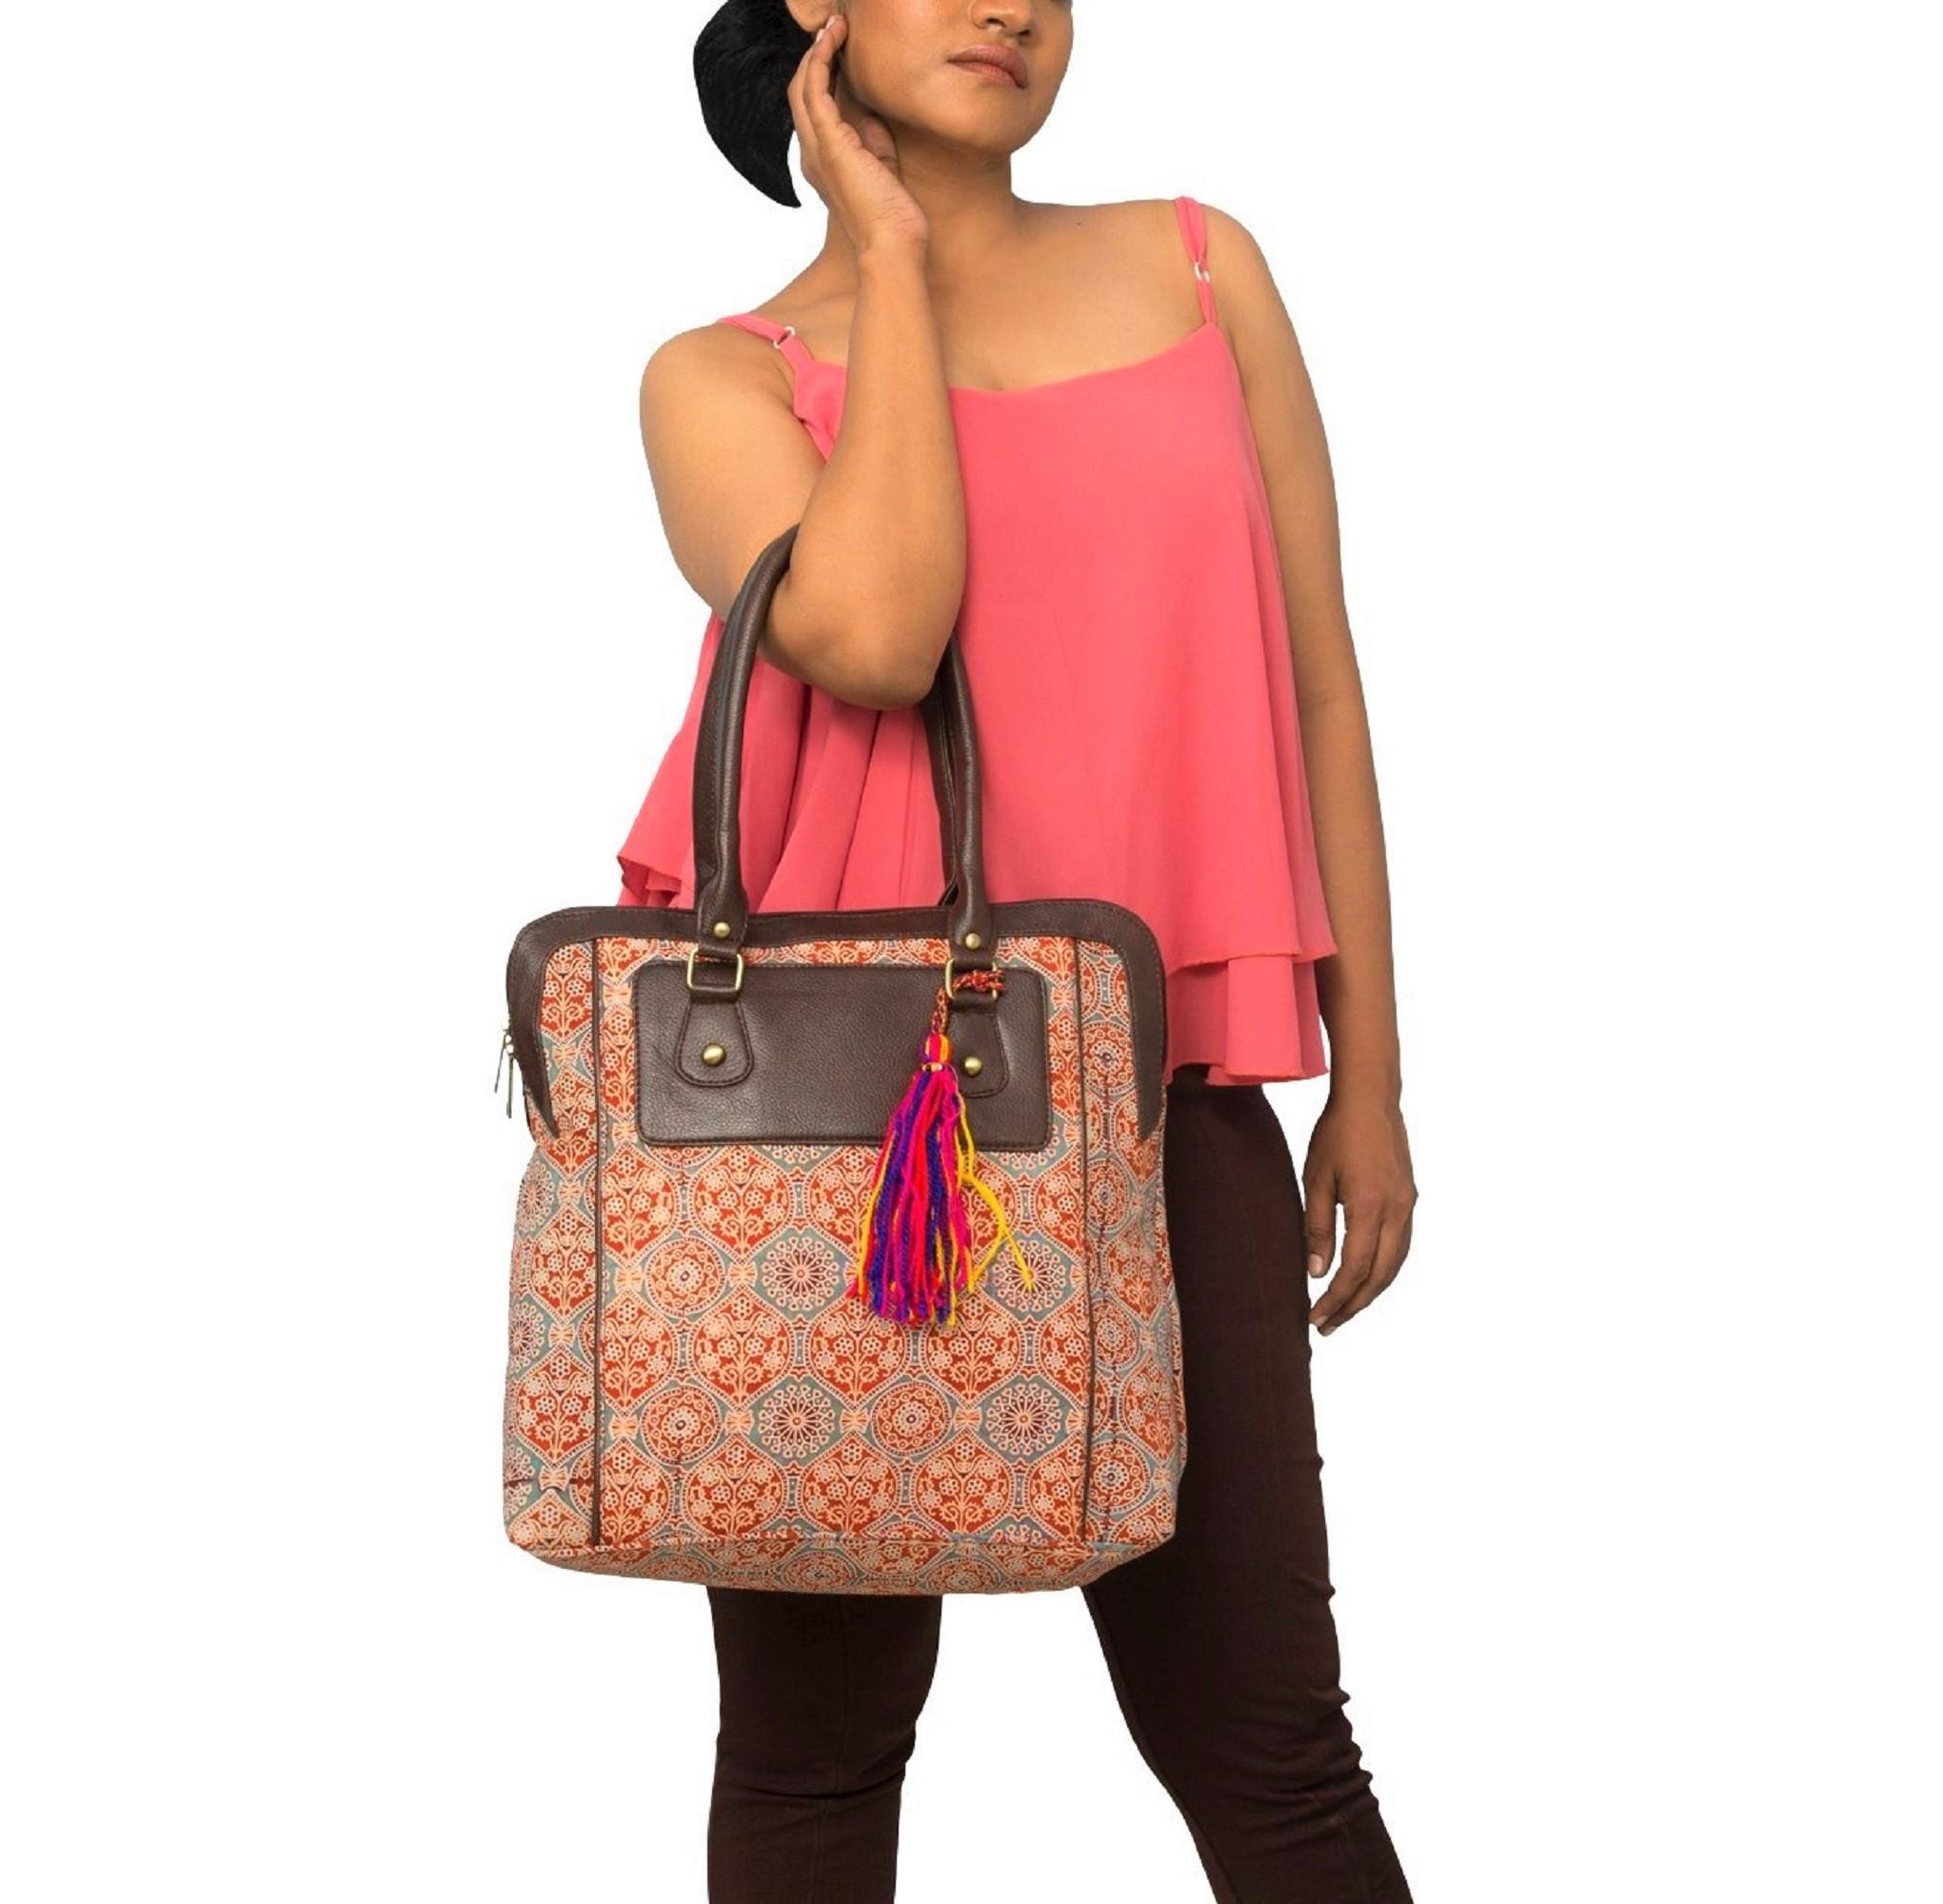 Vivinkaa | Vivinkaa ethnic faux leather cotton orange nice shoulder bag with tassle